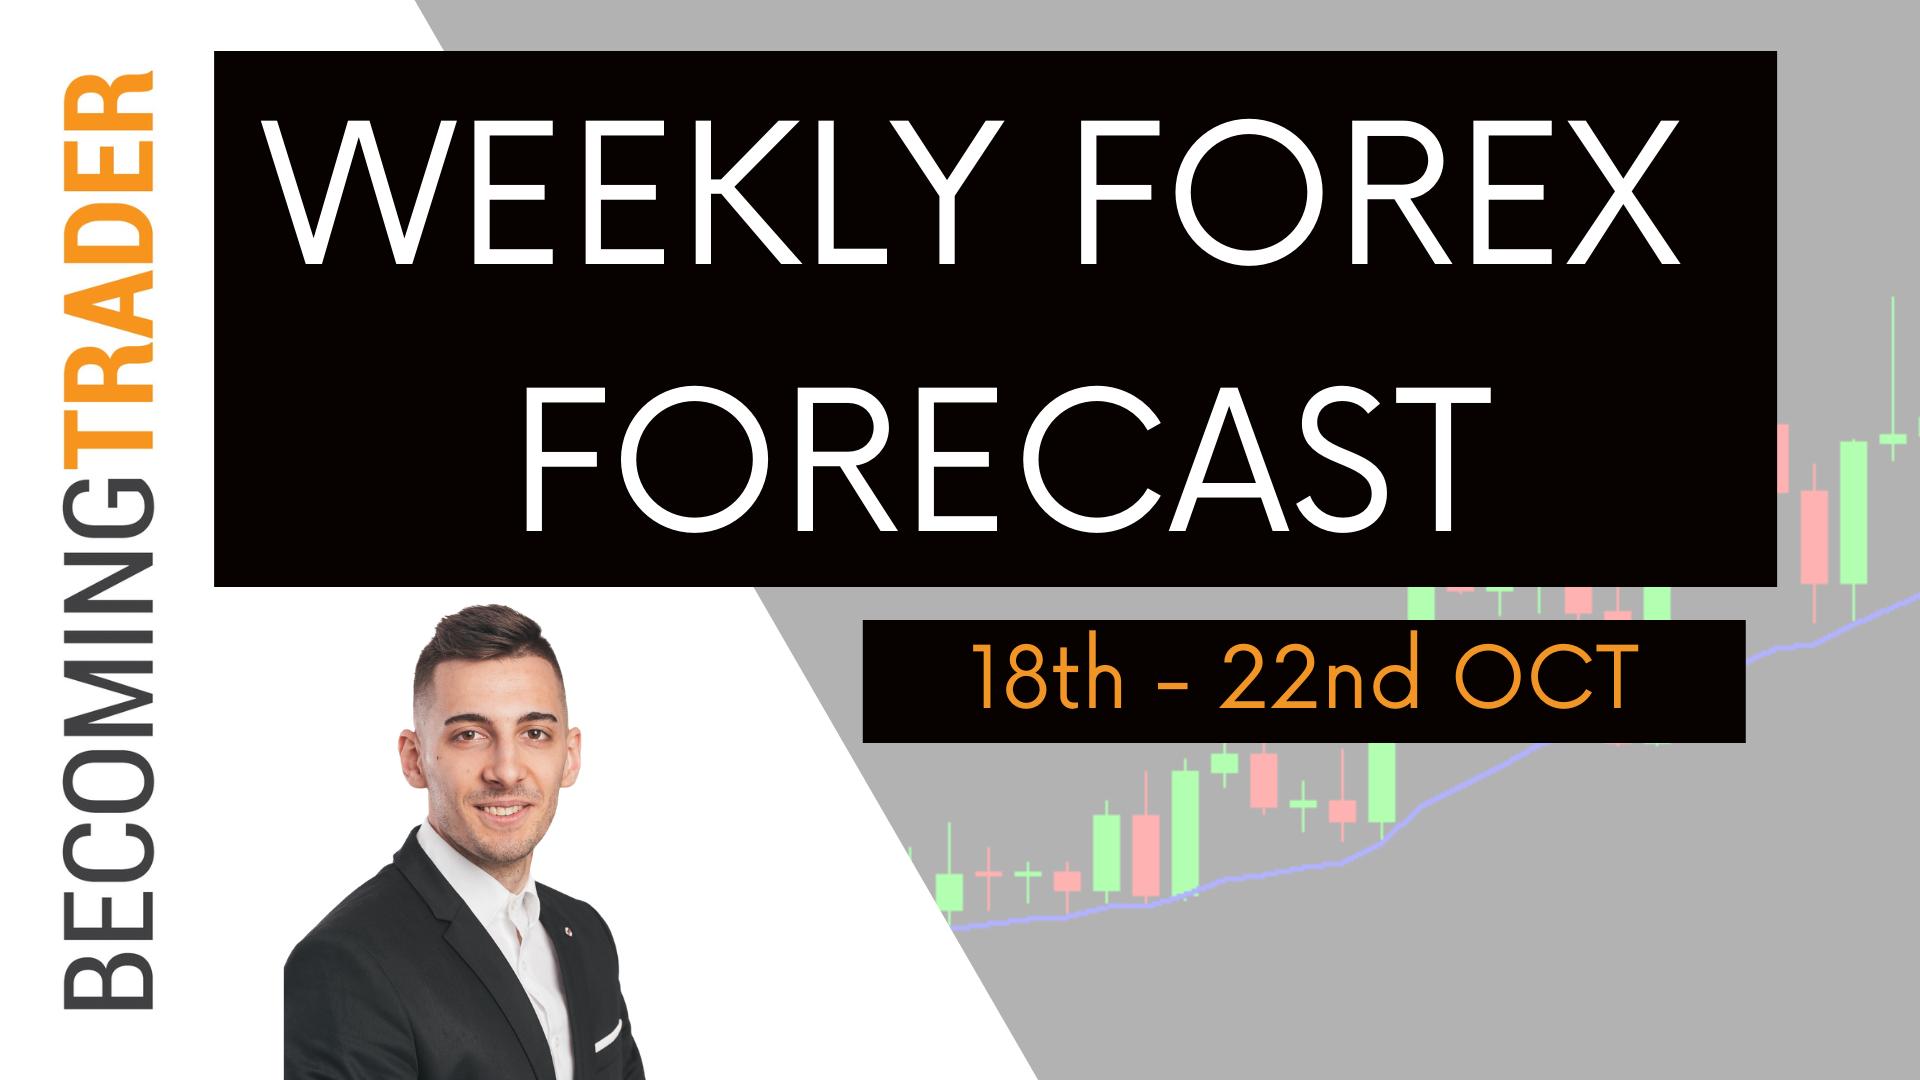 Weekly Forex Forecast 18th to 22nd Oct 2021   EURUSD , GBPUSD , AUDUSD , NZDUSD , USDCAD , USDJPY